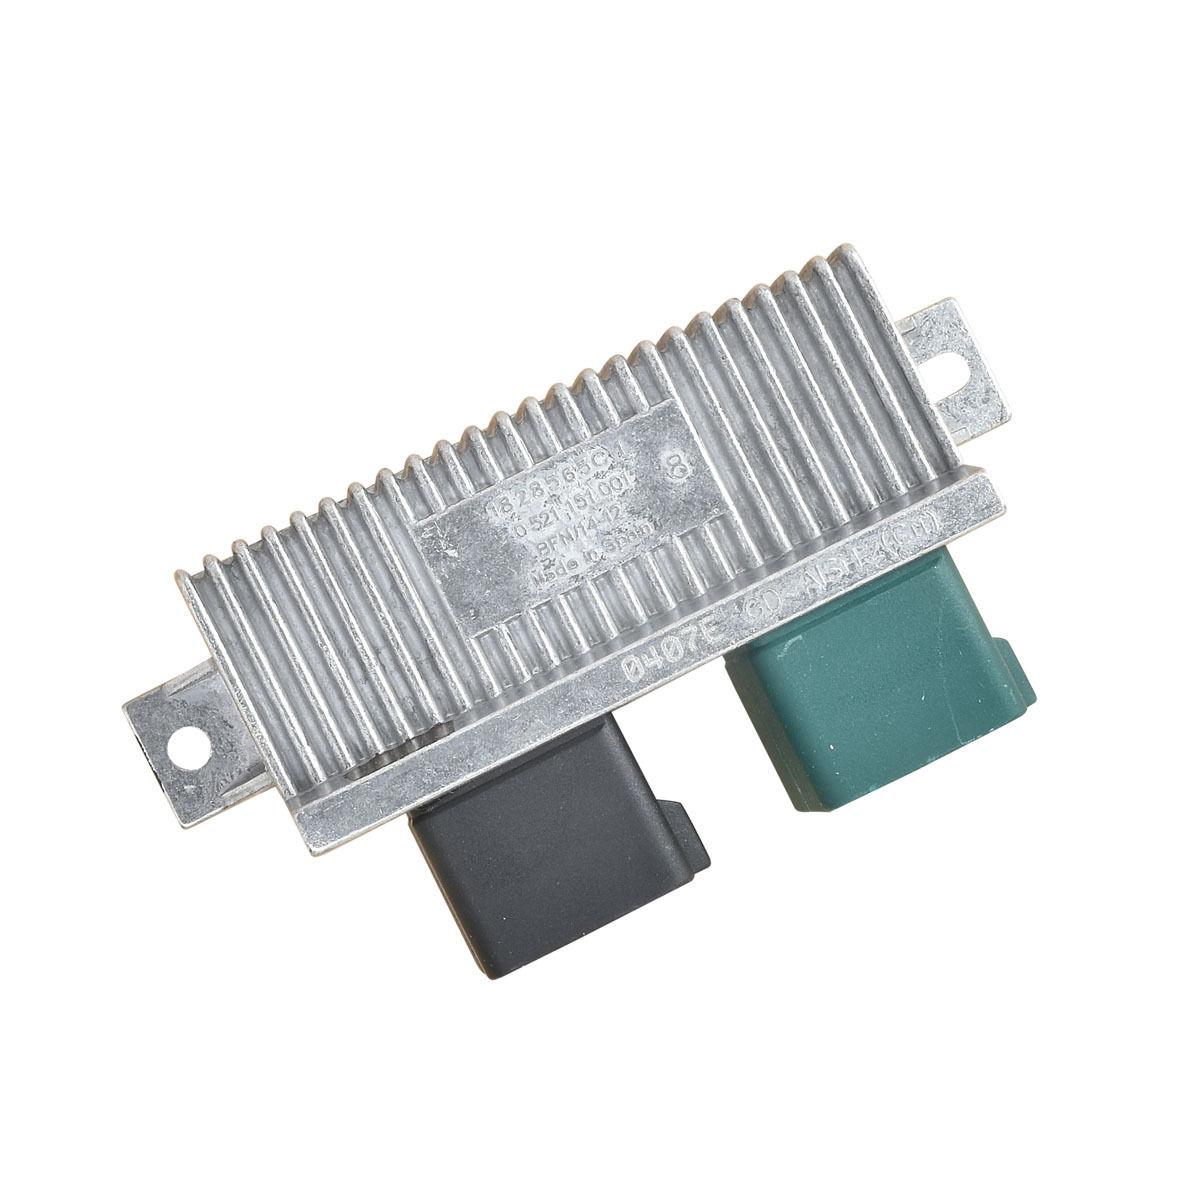 OEM Glow Plug Control Module for 94-10 7.3L 6.0L 6.4L Powerstroke